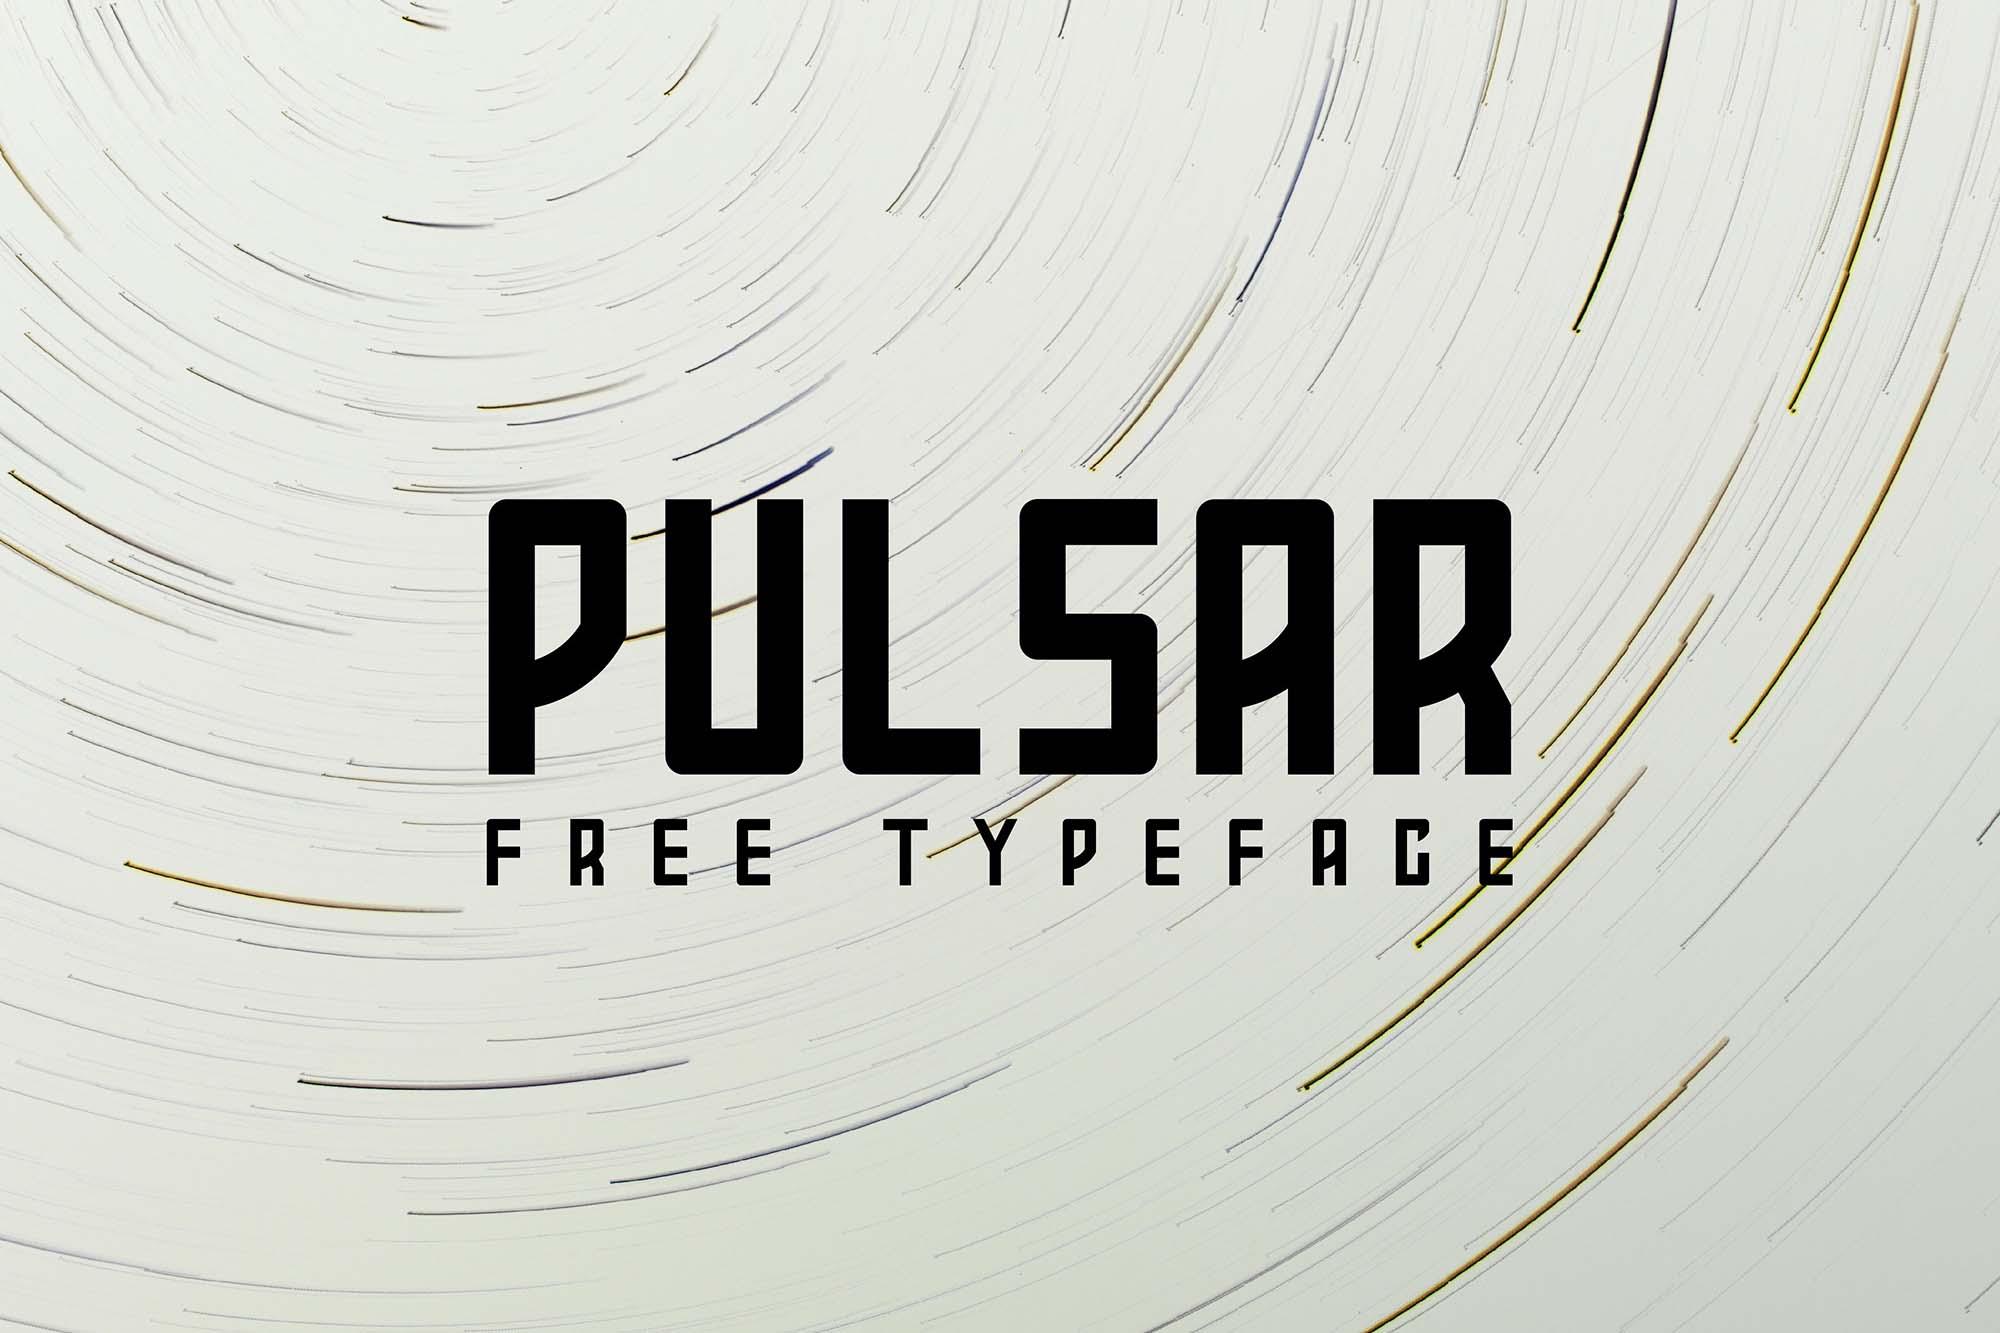 Pulsar Typeface 2